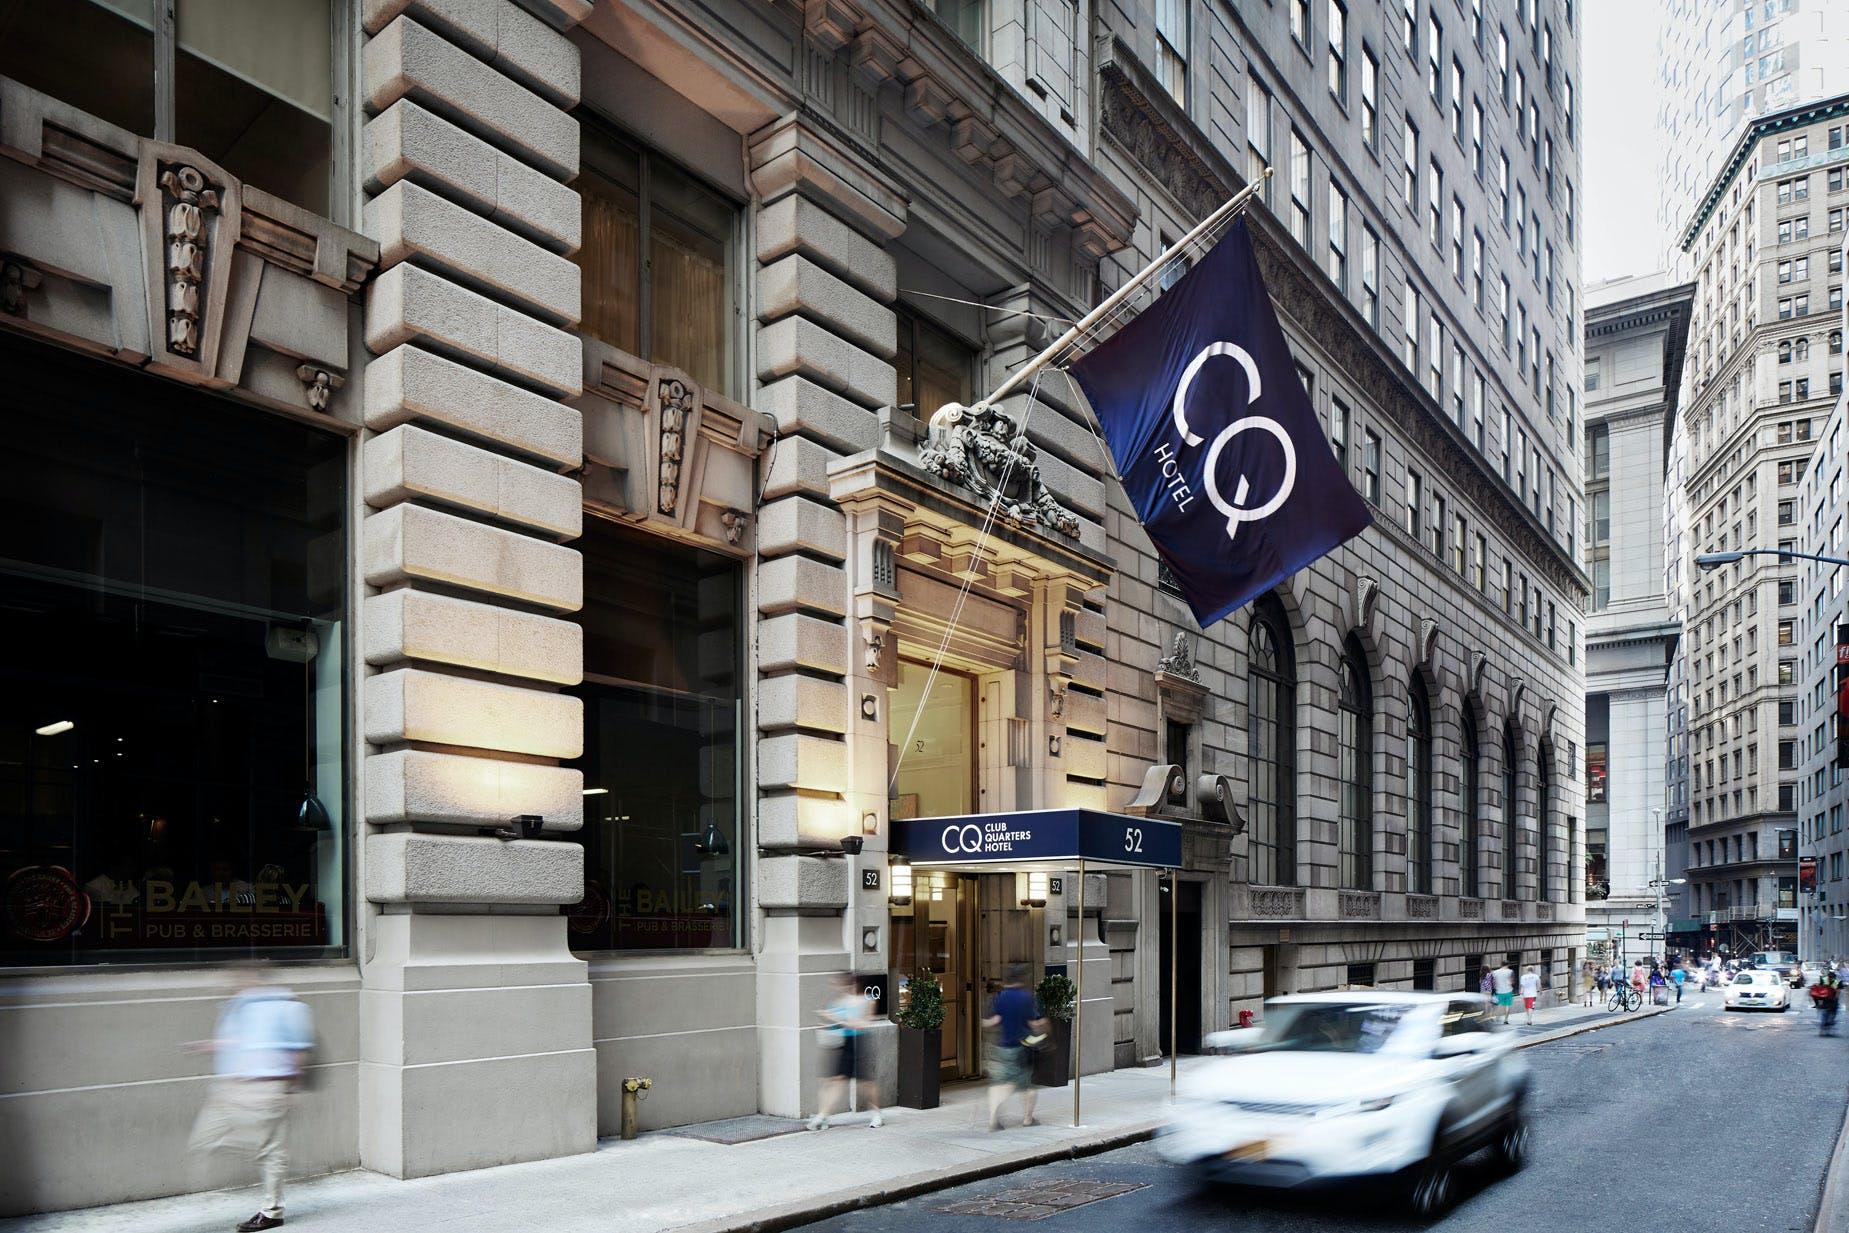 Exterior of Club Quarters Hotel, Wall Street